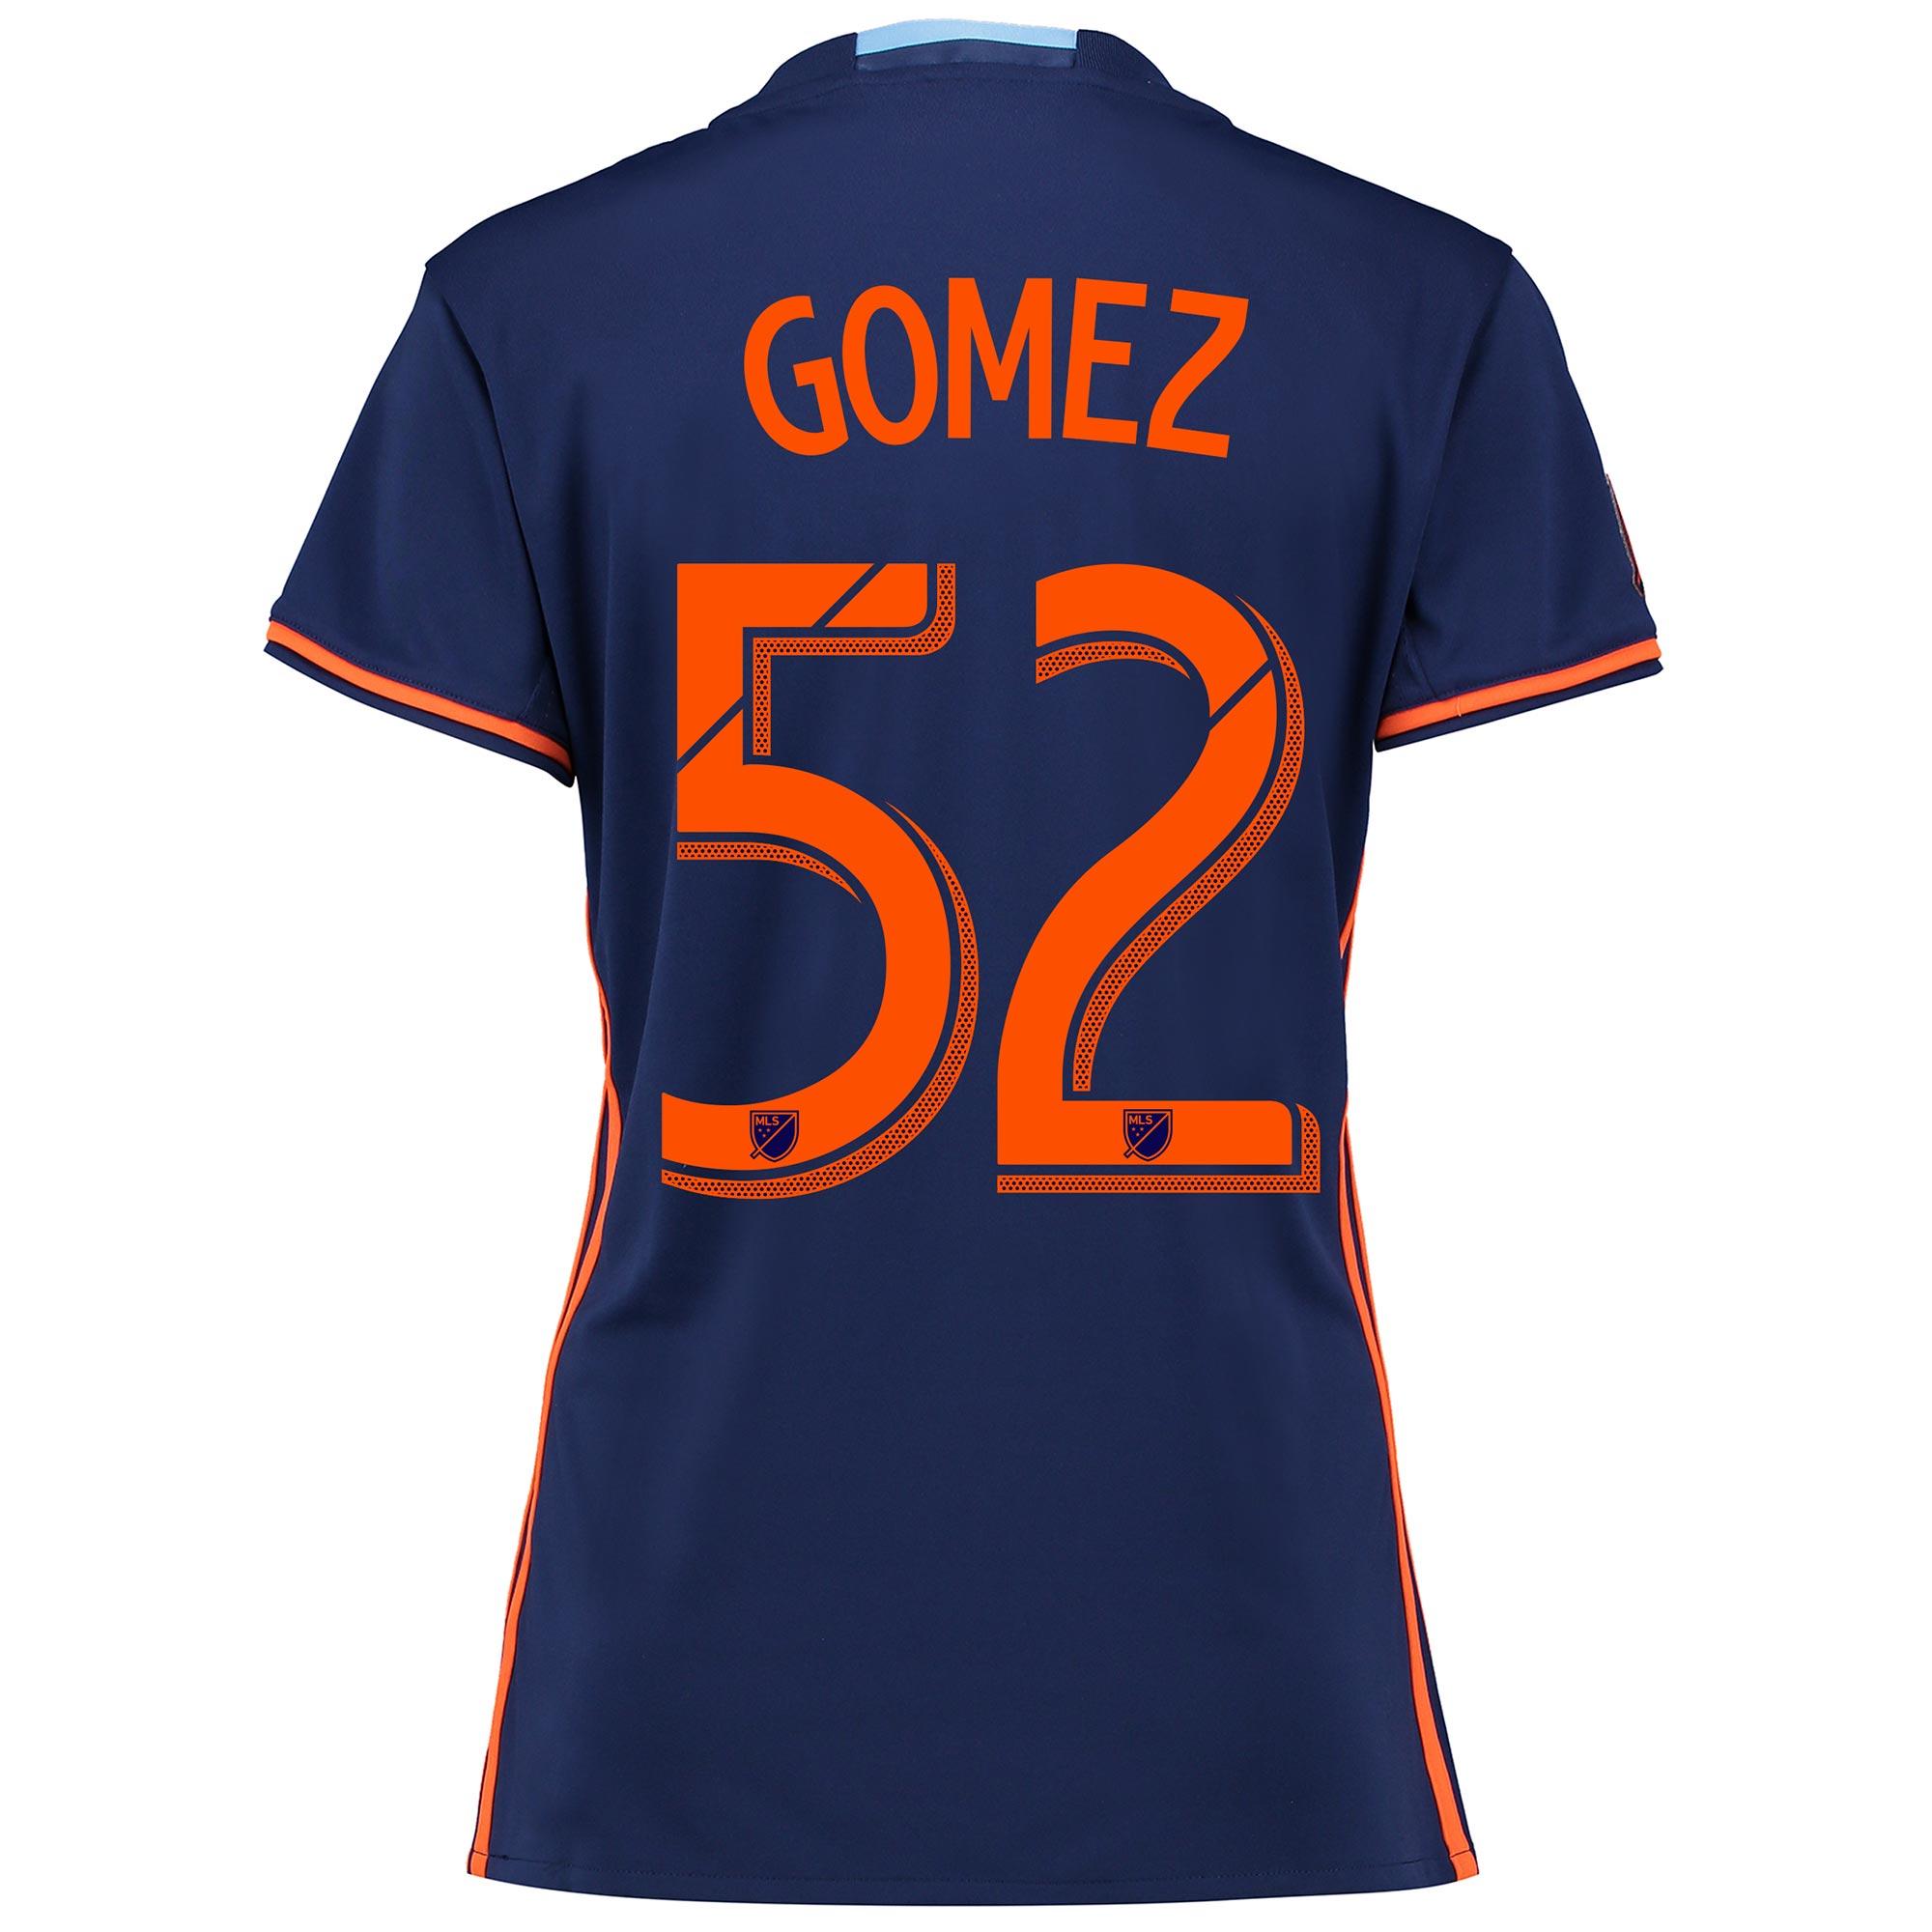 New York City FC Away Shirt 2016 - Womens with Gomez 52 printing